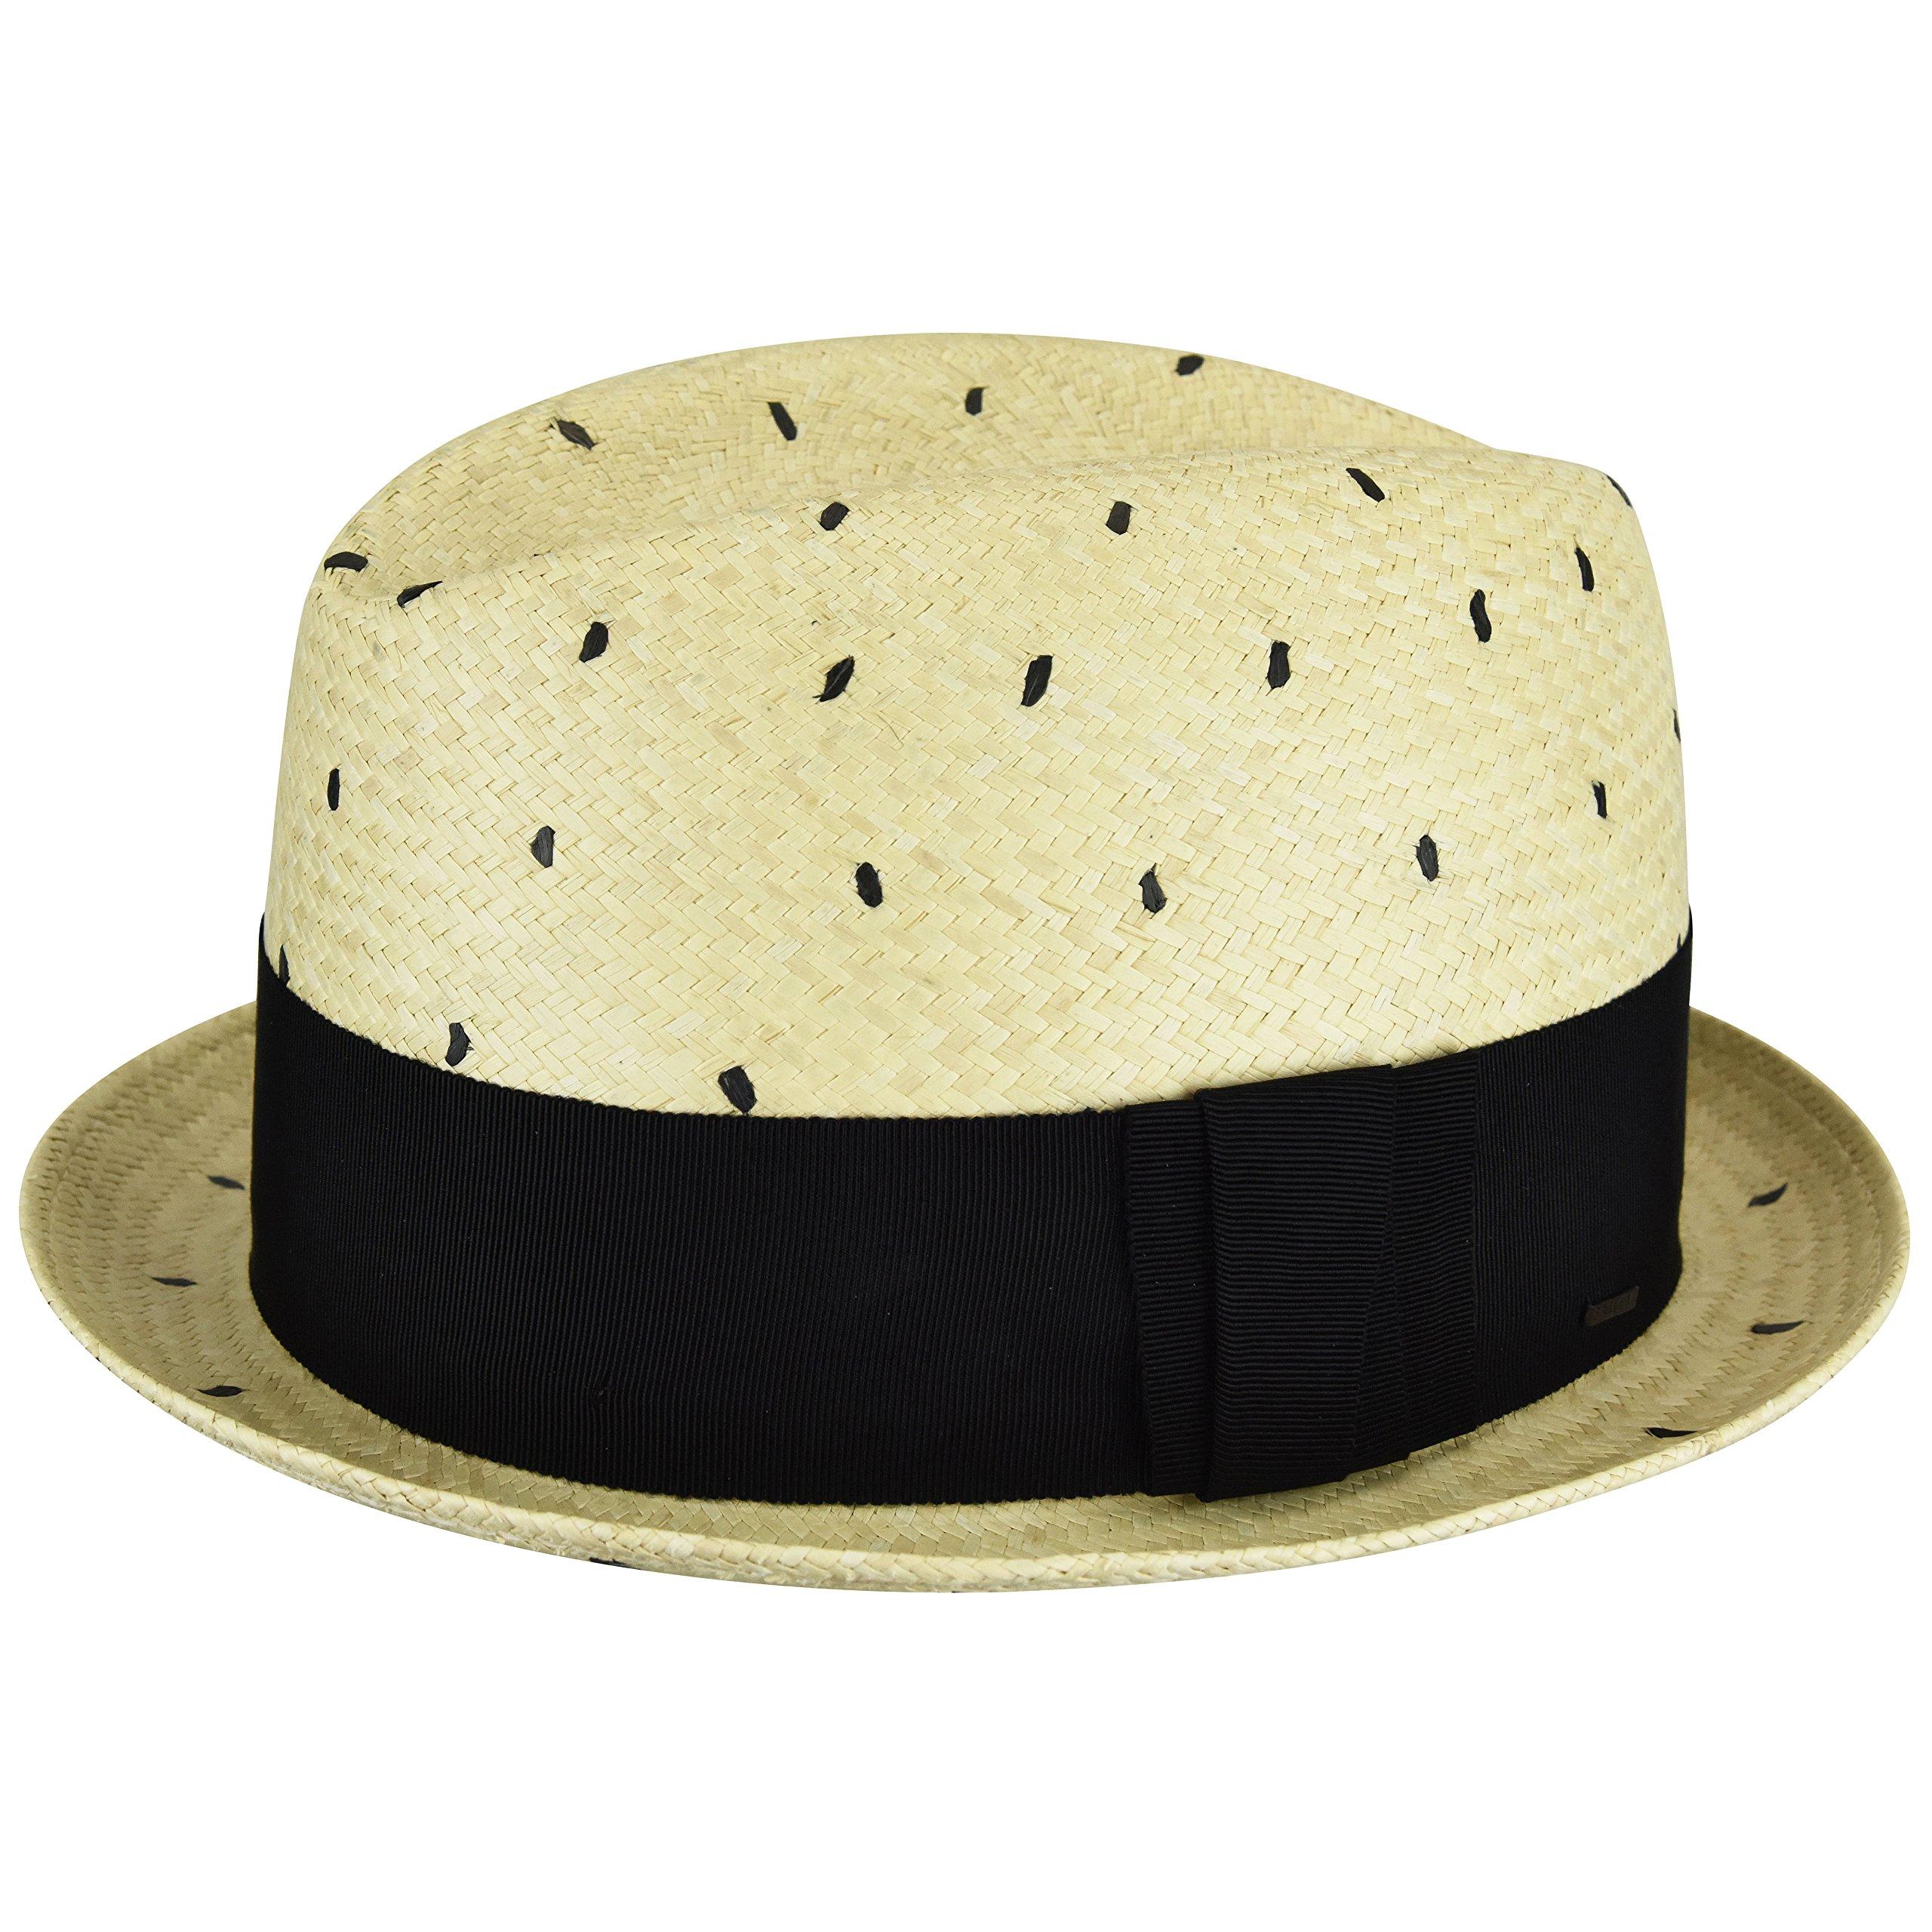 Bailey Of Hollywood Male Male Tor Short Panama Fedora Natural/Black Dot M Natural/Black Dot M